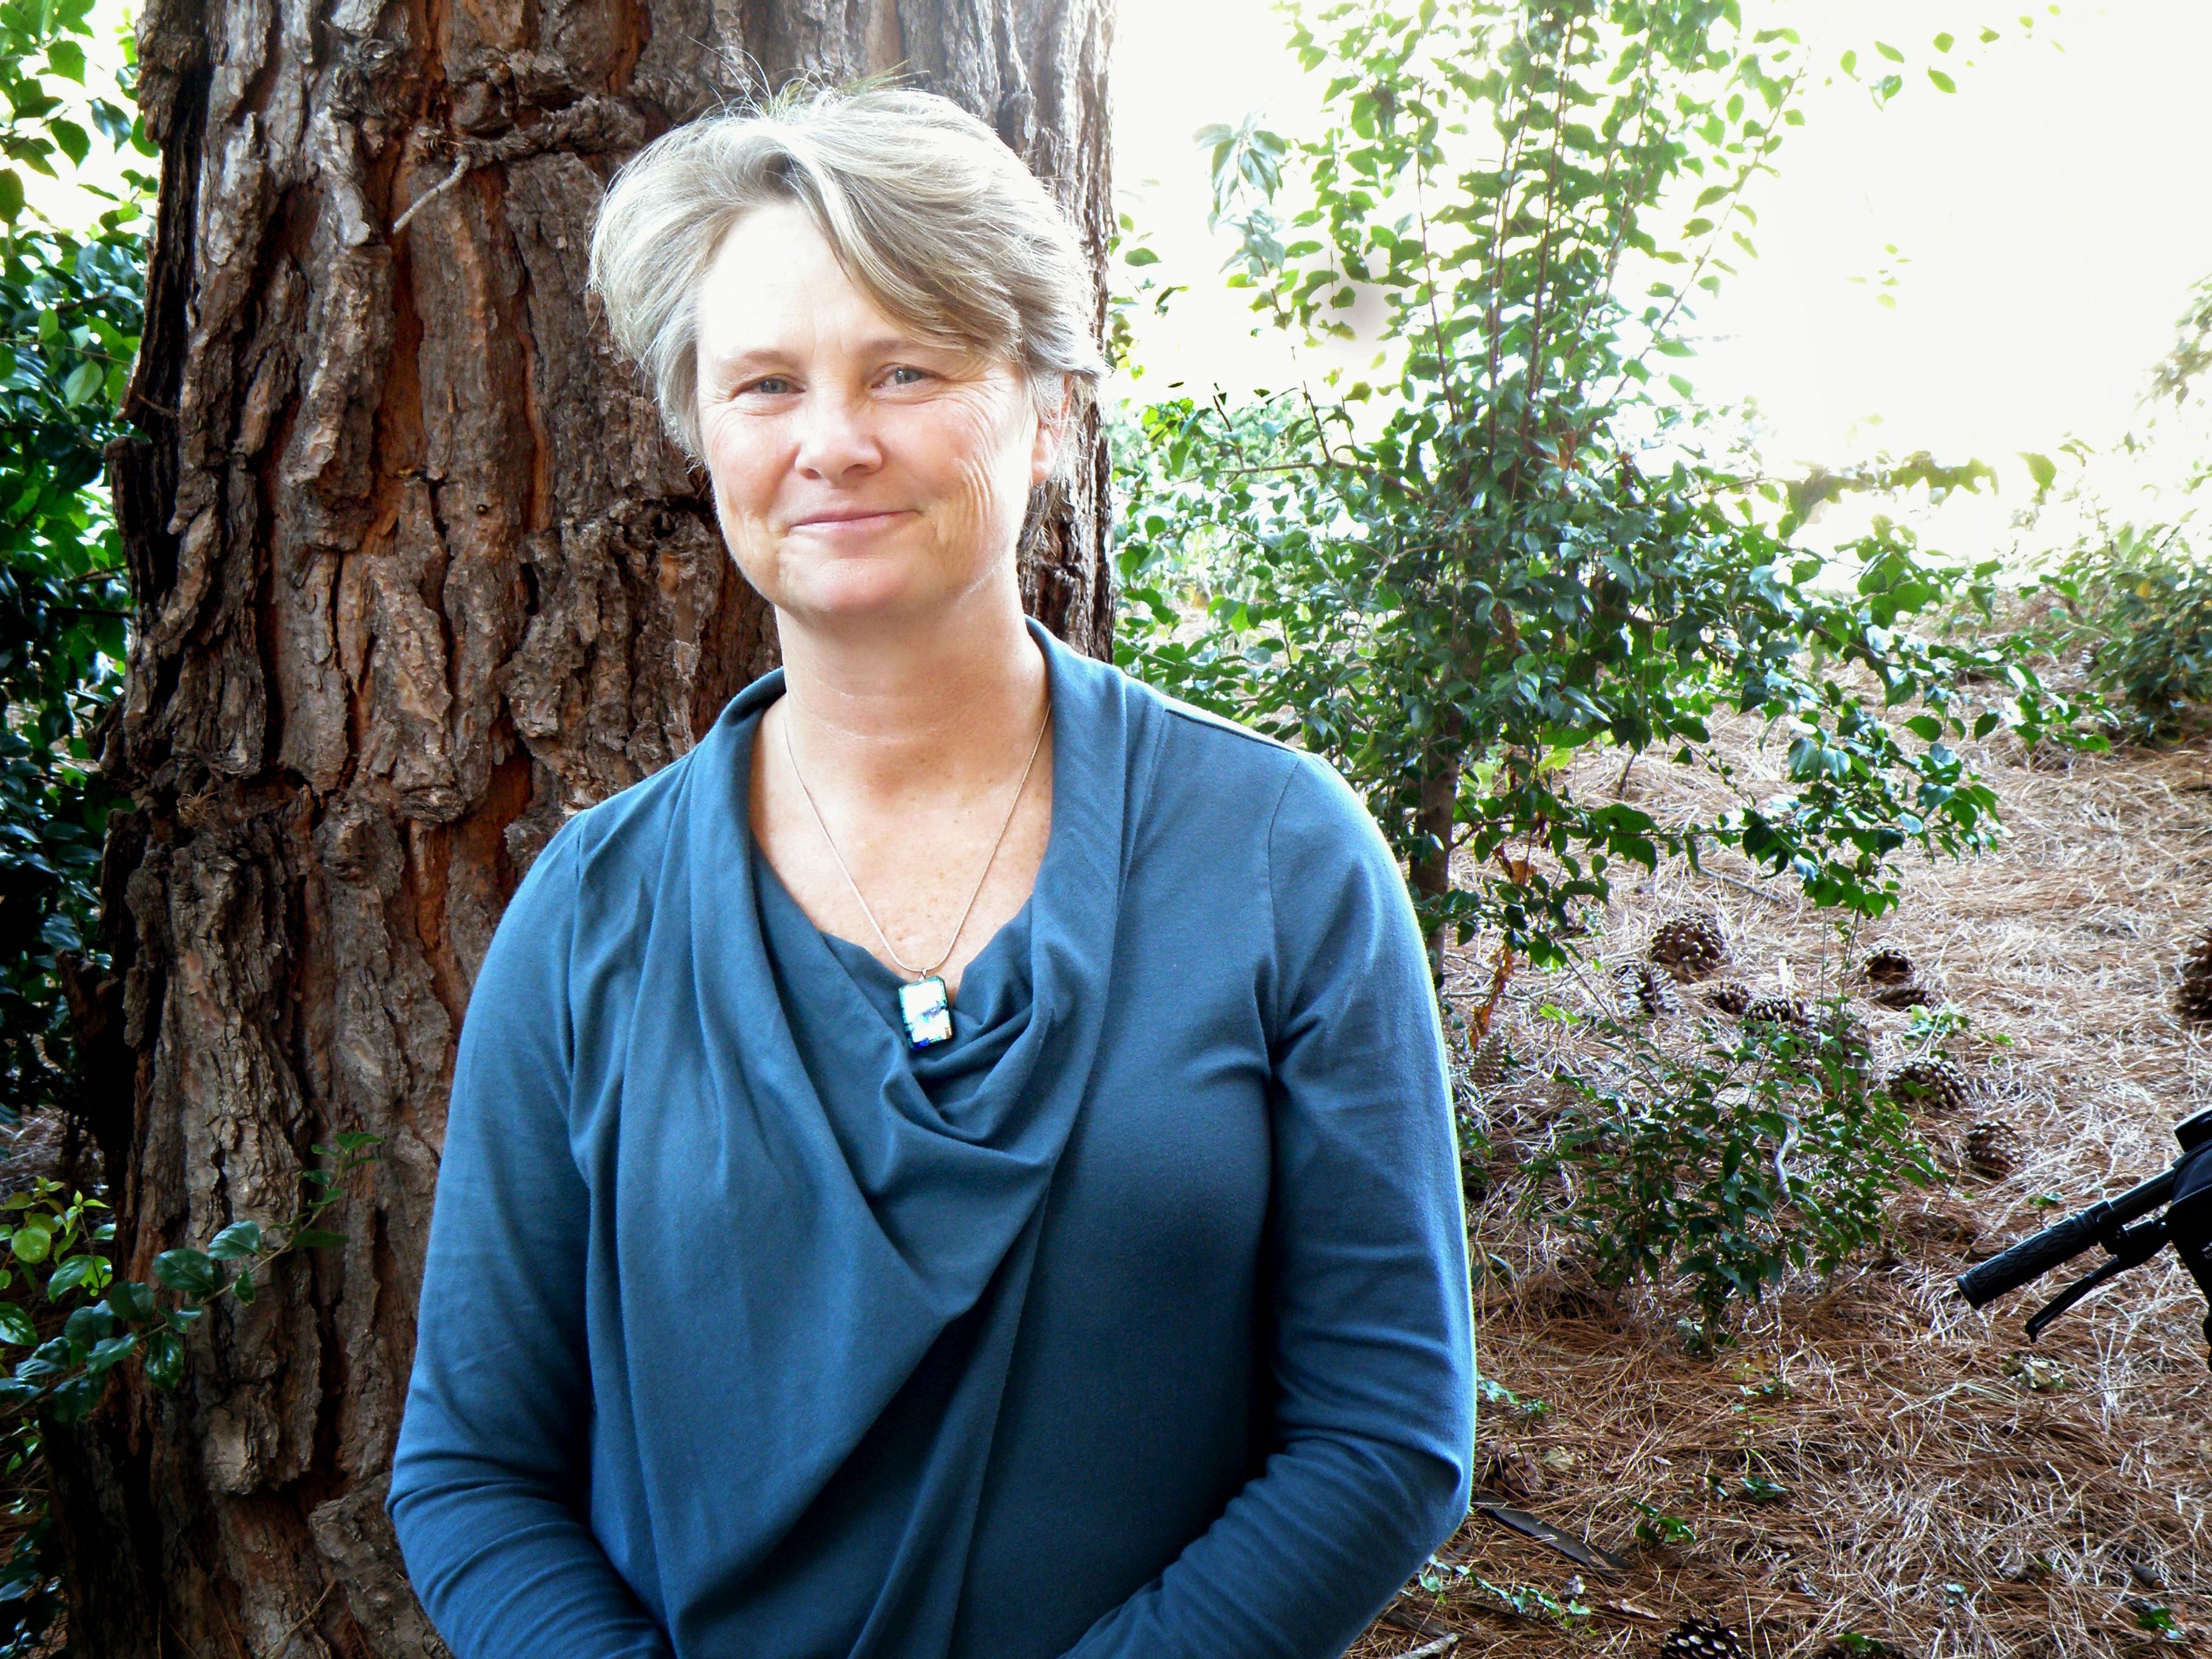 Headshot of the Biomimicry Institute's Janine Benyus at the Bioneers 2013